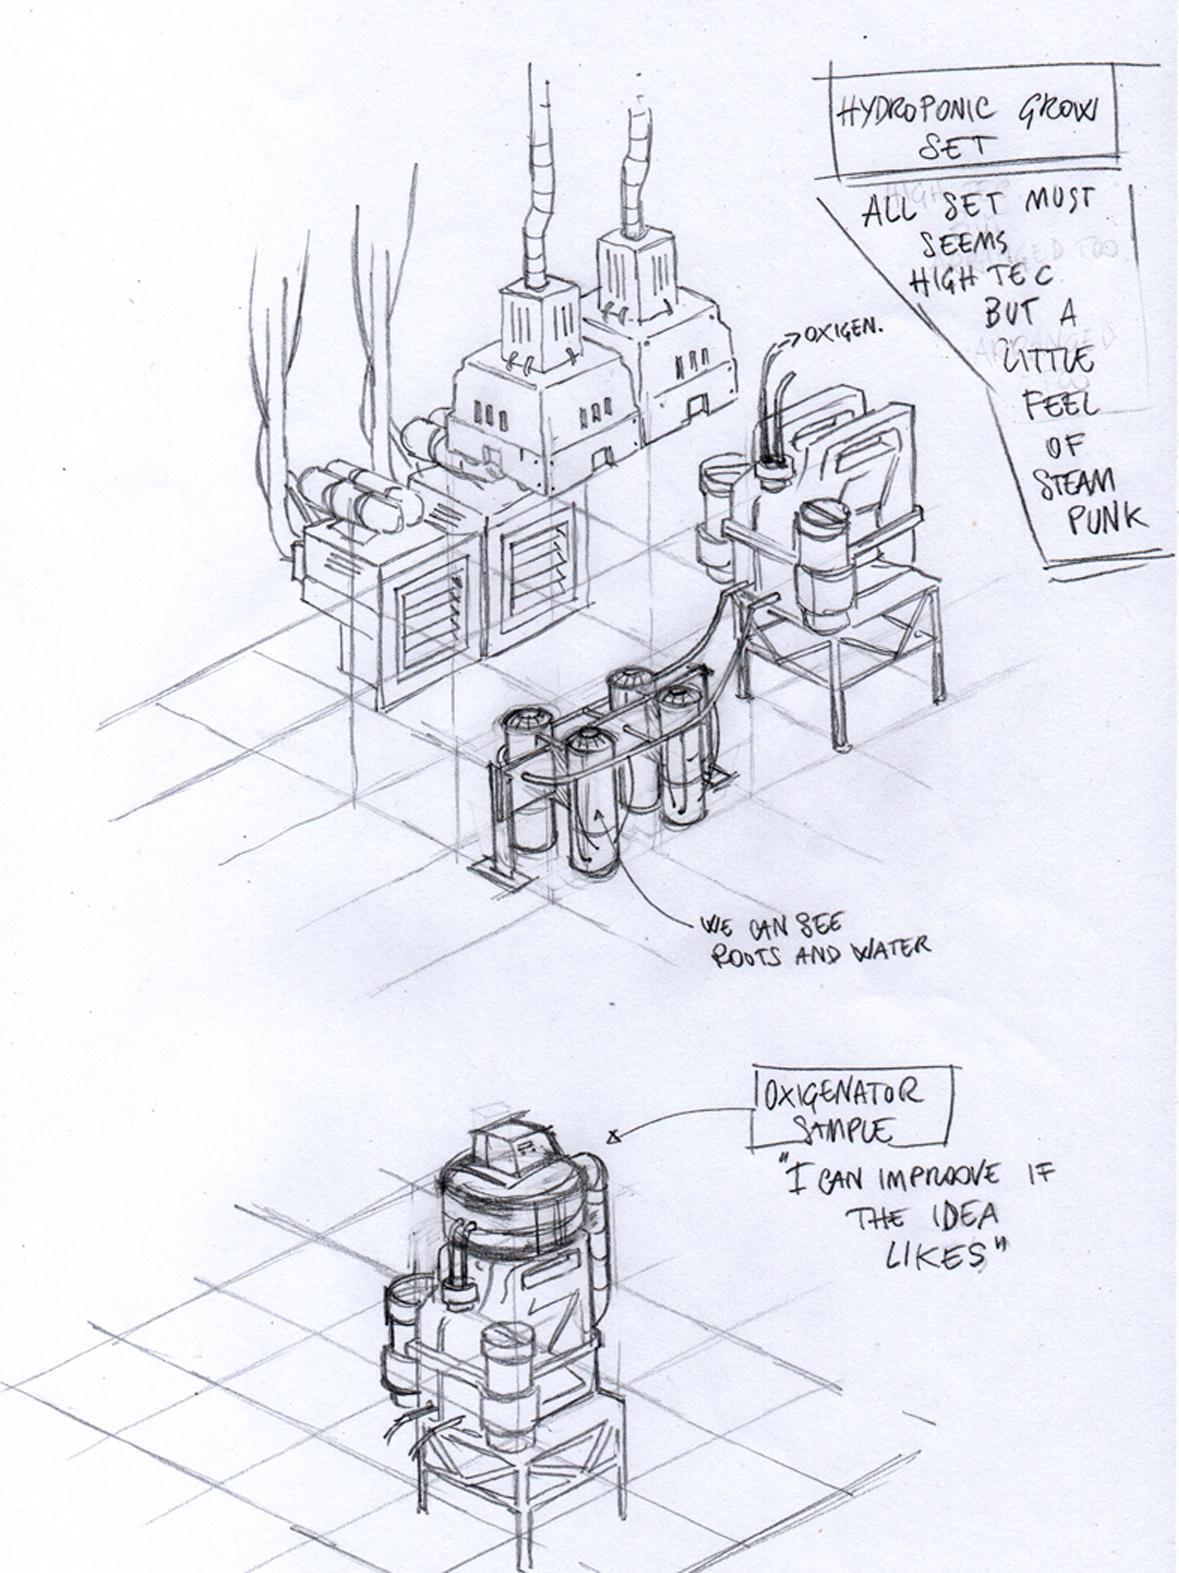 items-2.jpg